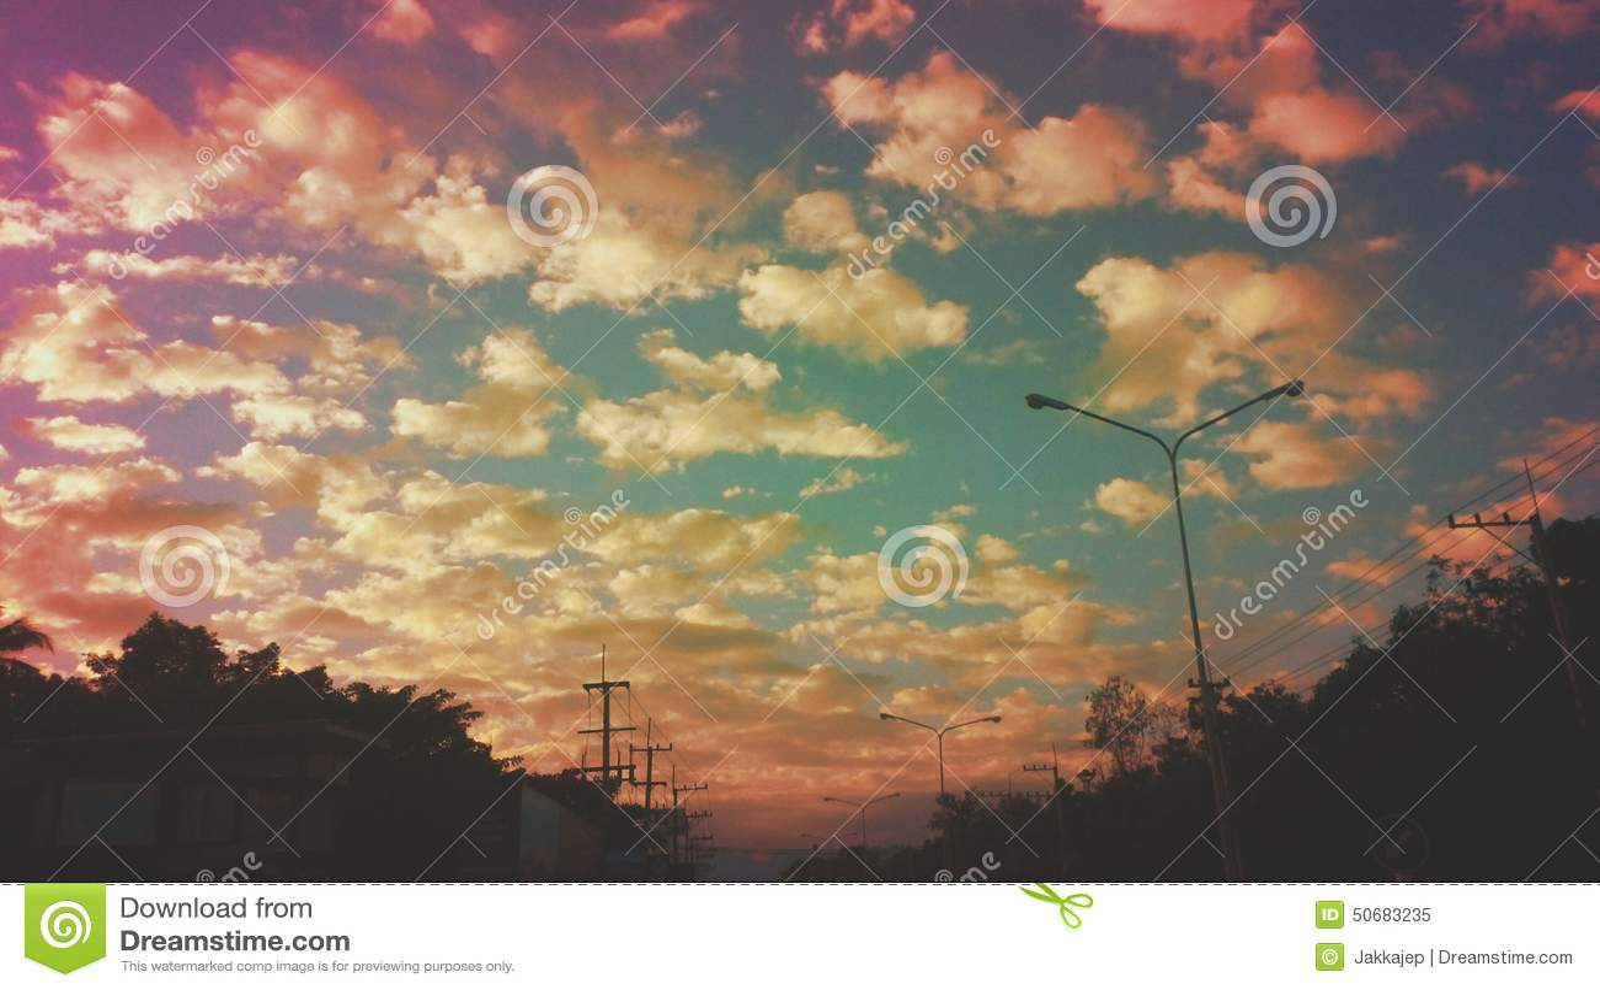 Download 暮色skyandclouds 库存图片. 图片 包括有 横向, 墙纸, 天空, 背包, 微明 - 50683235